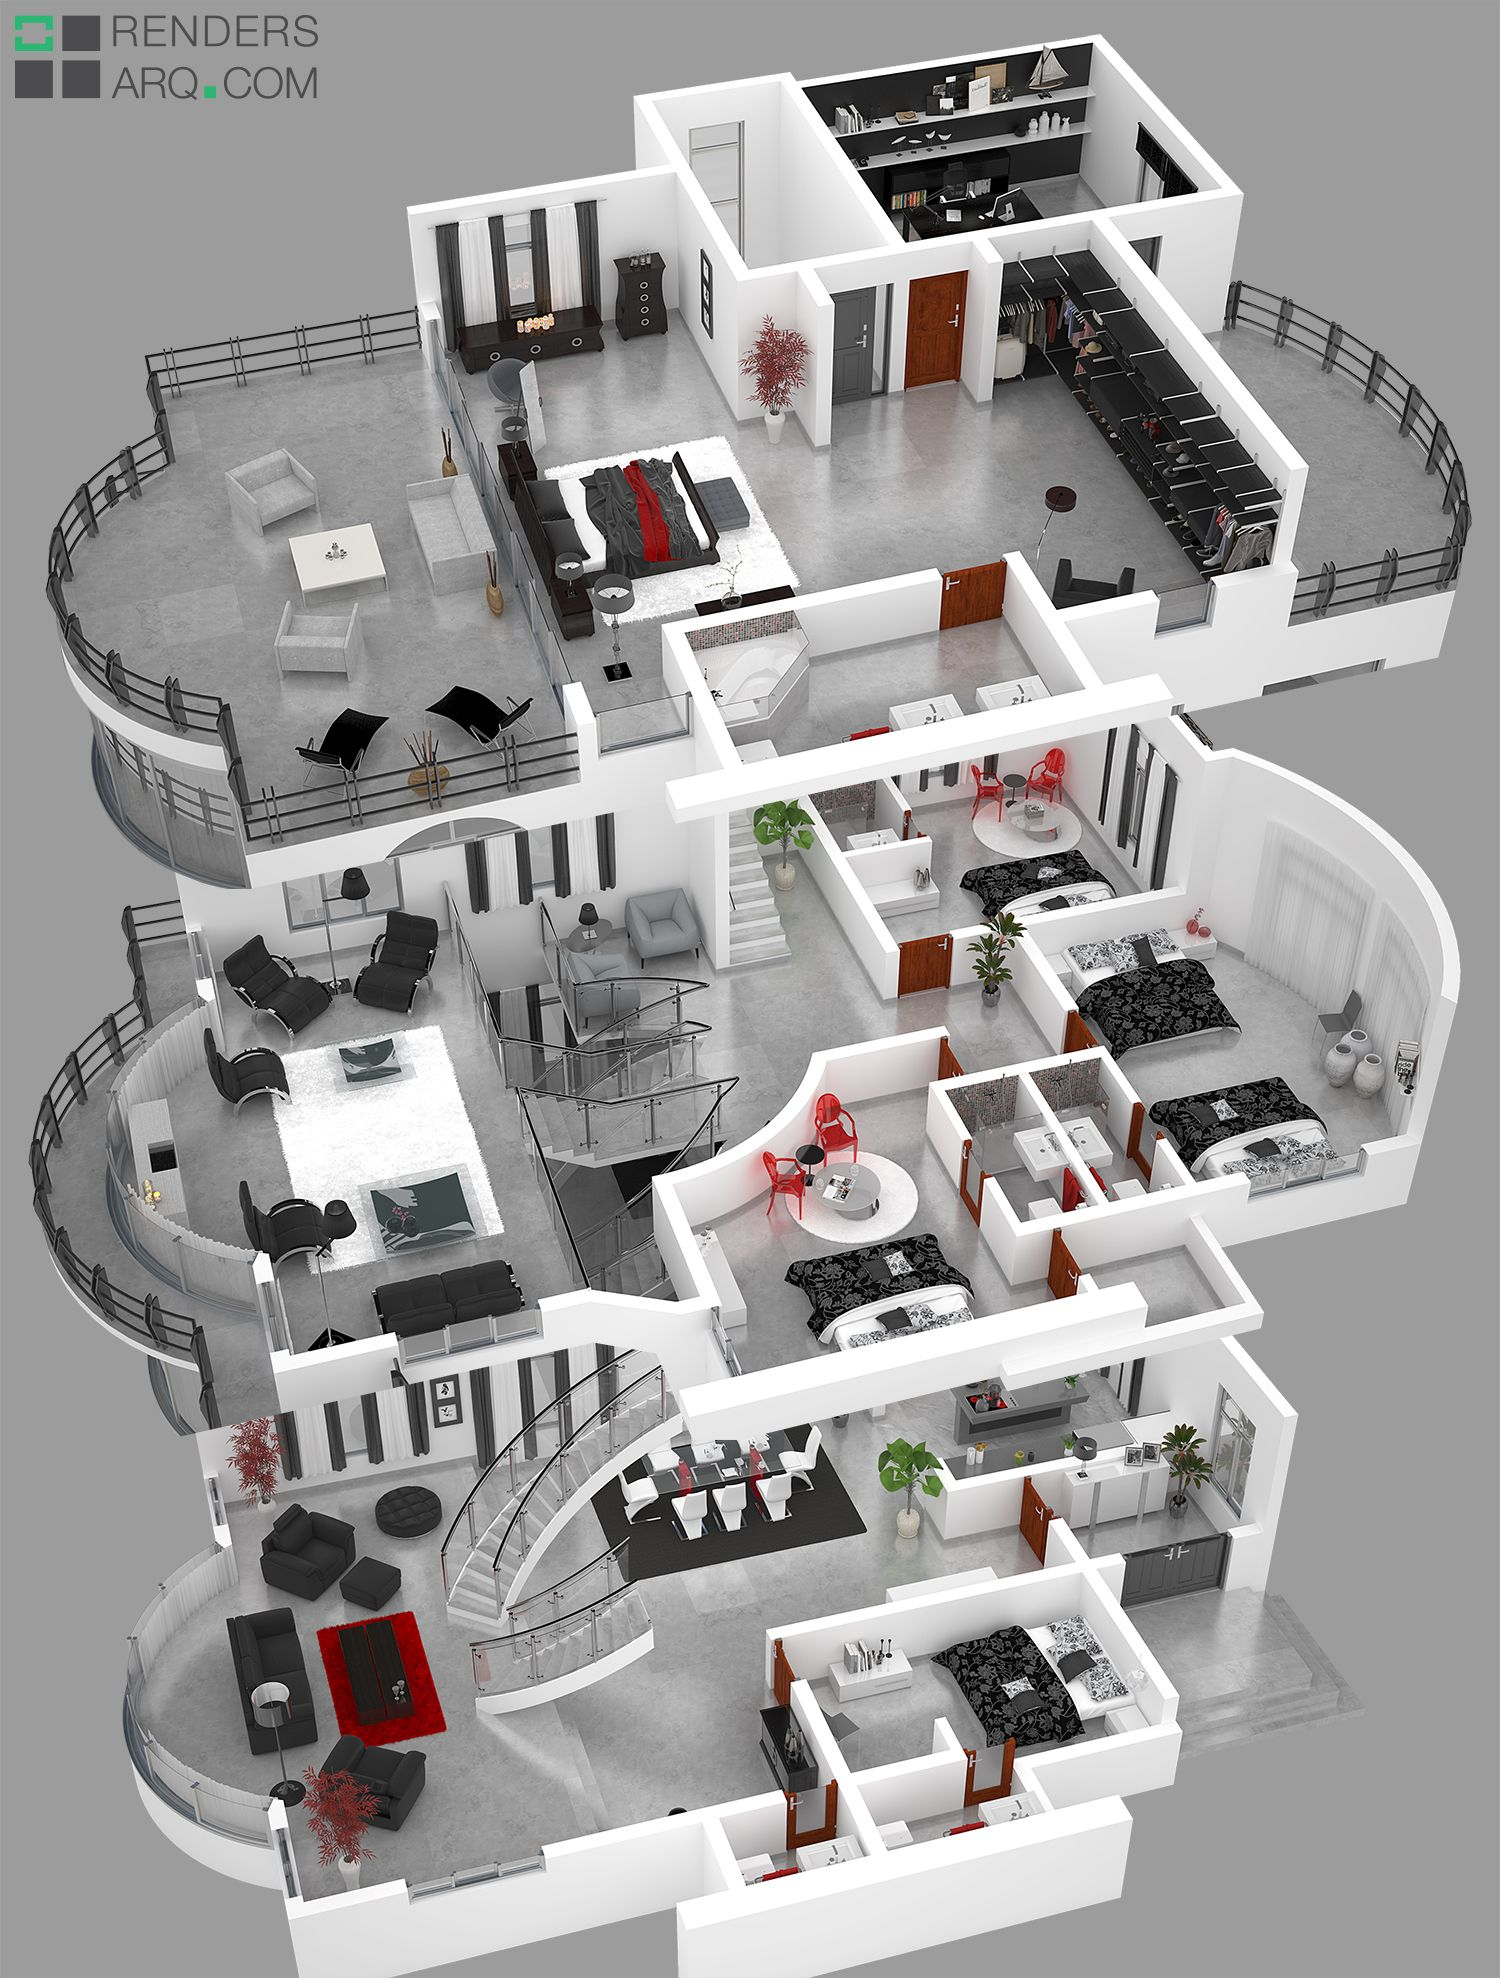 Plantas 3d home building your own space en 2019 - Diseno de casas 3d ...